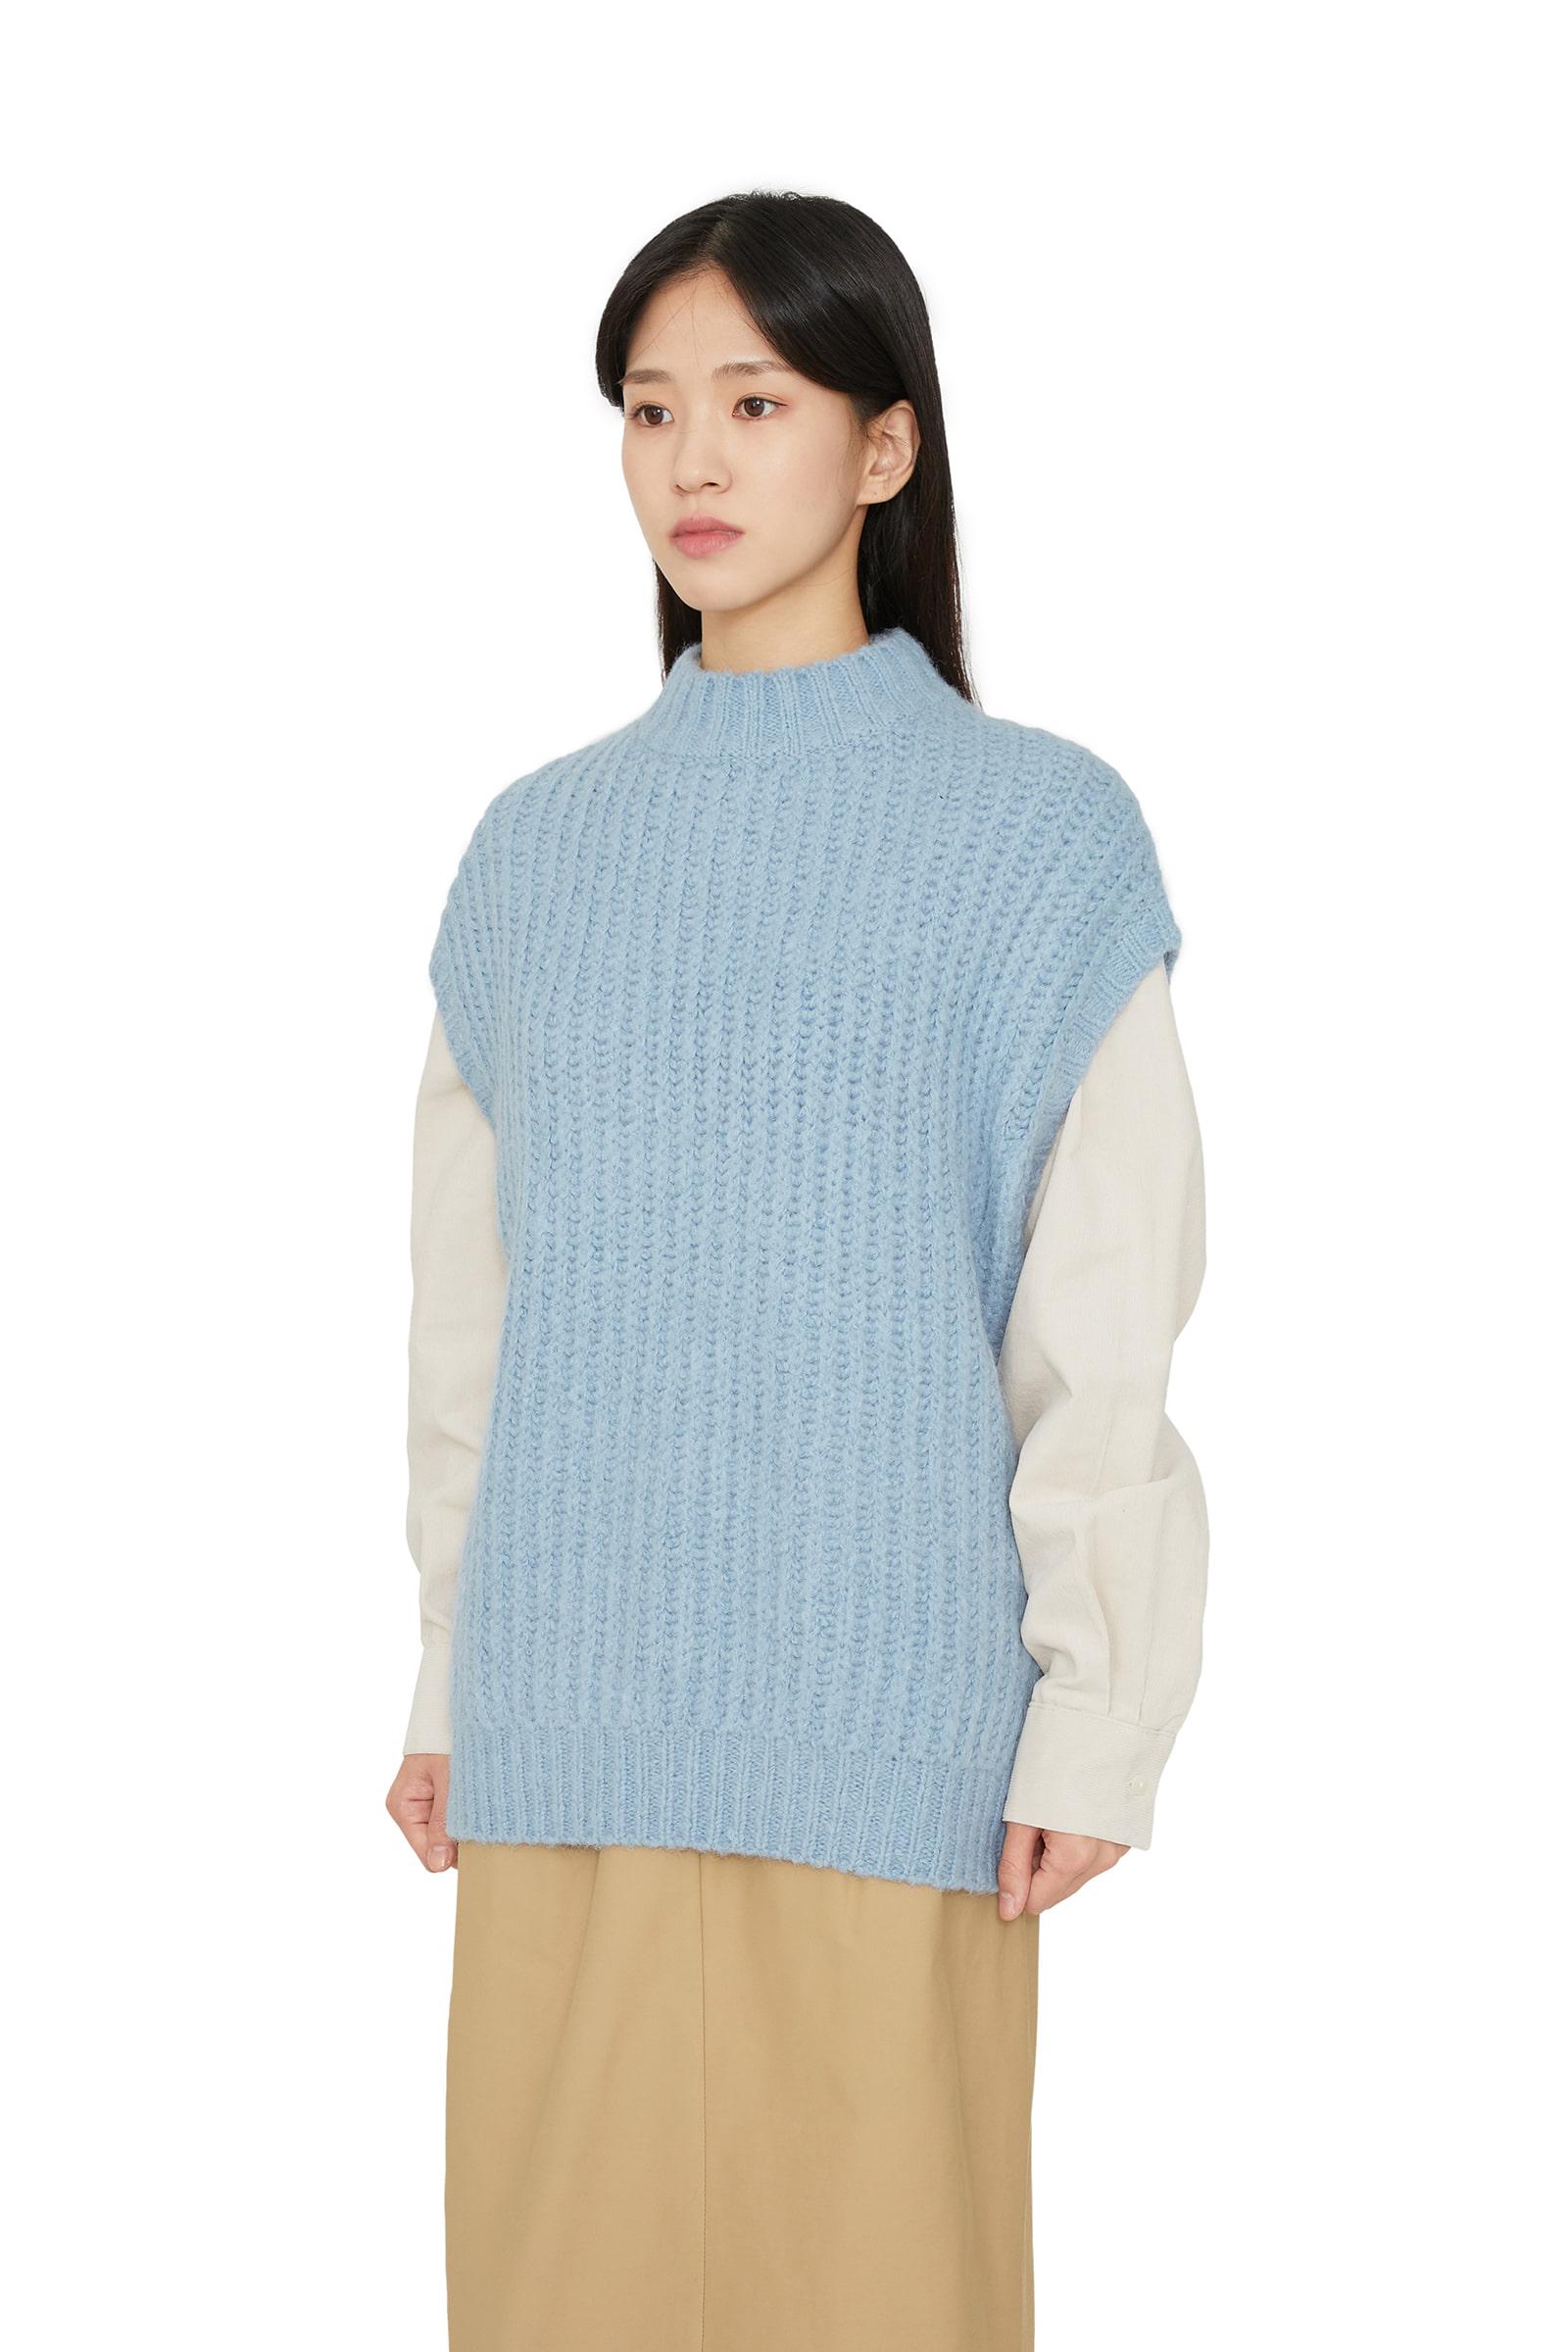 Clap alpaca wool turtleneck knit top